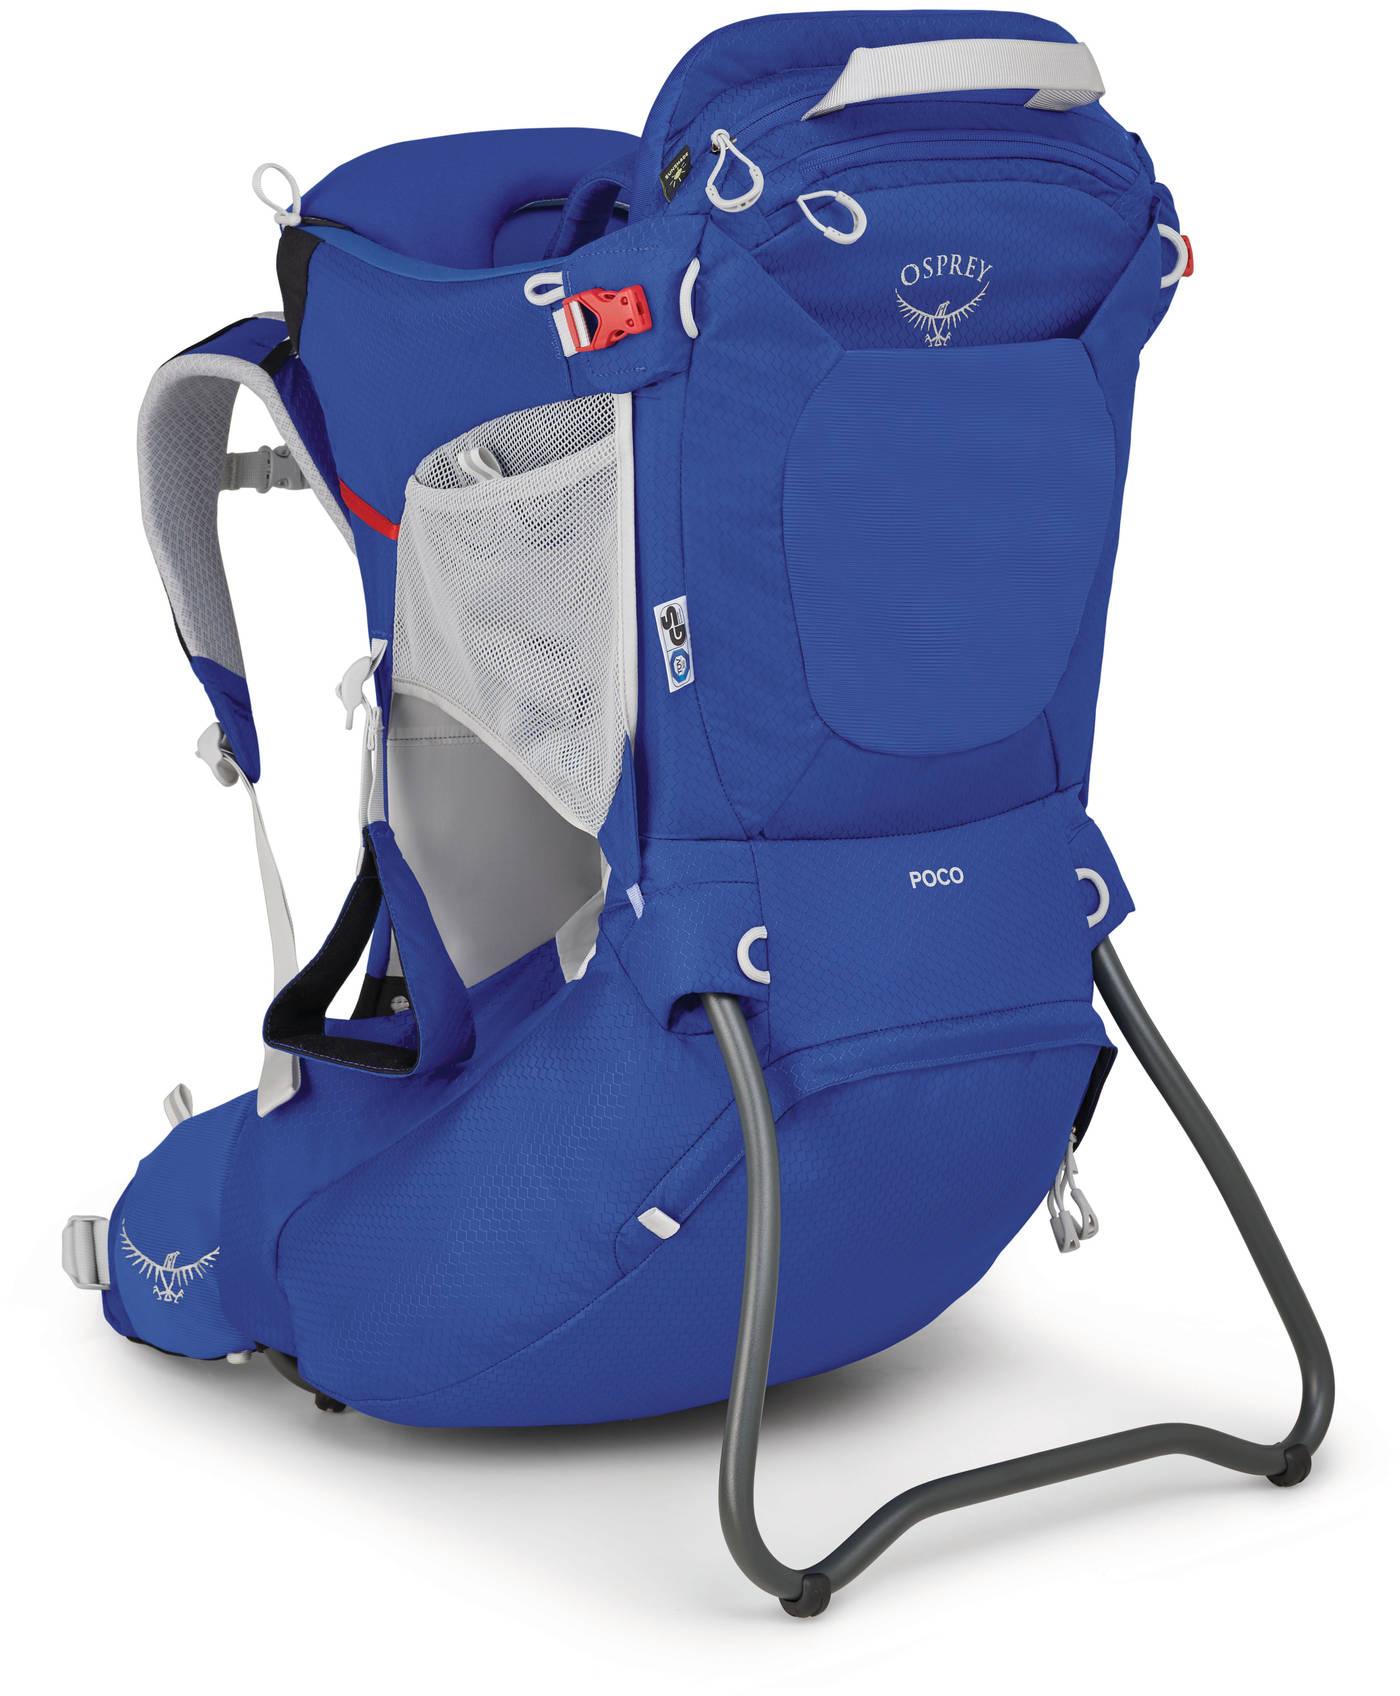 Переноски для детей Рюкзак переноска для ребенка Osprey Poco Blue Sky Poco_S20_Side_Blue_Sky_web.jpg